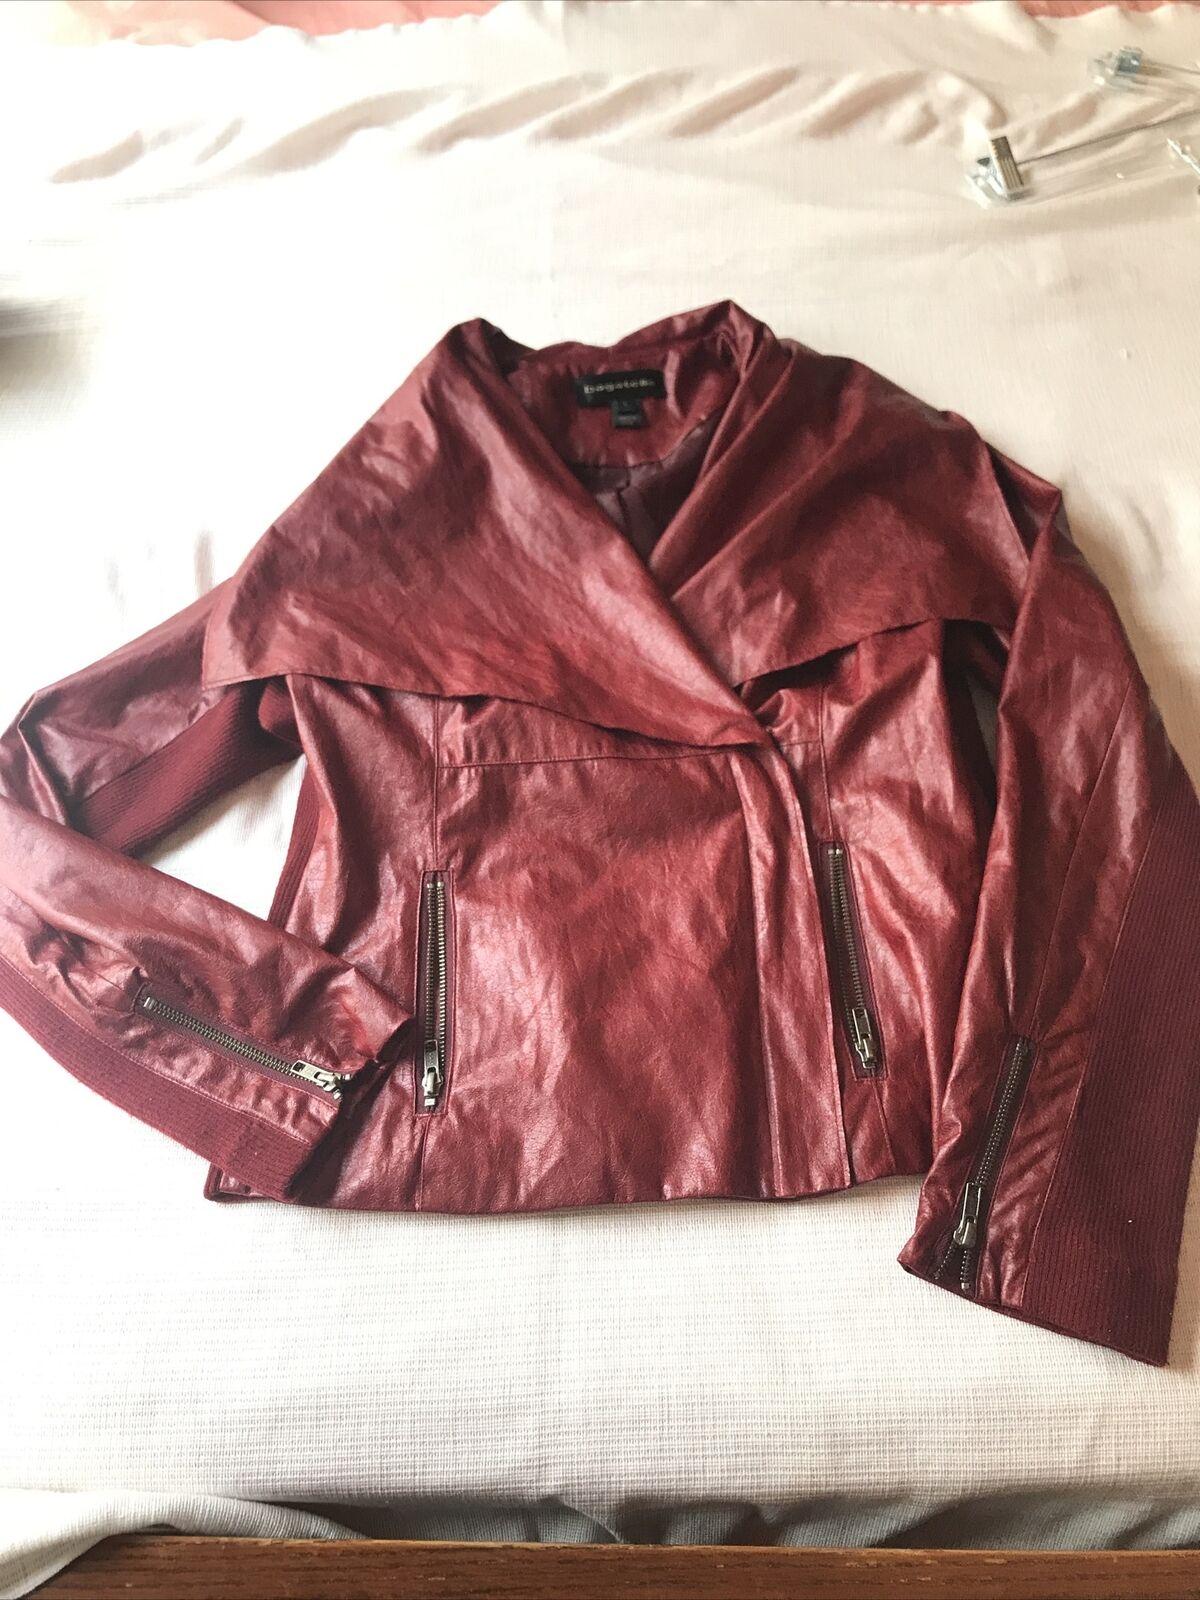 Bagatelle, Red Draped Open-Front Faux Leather, Women's Jacket Coat, Size L